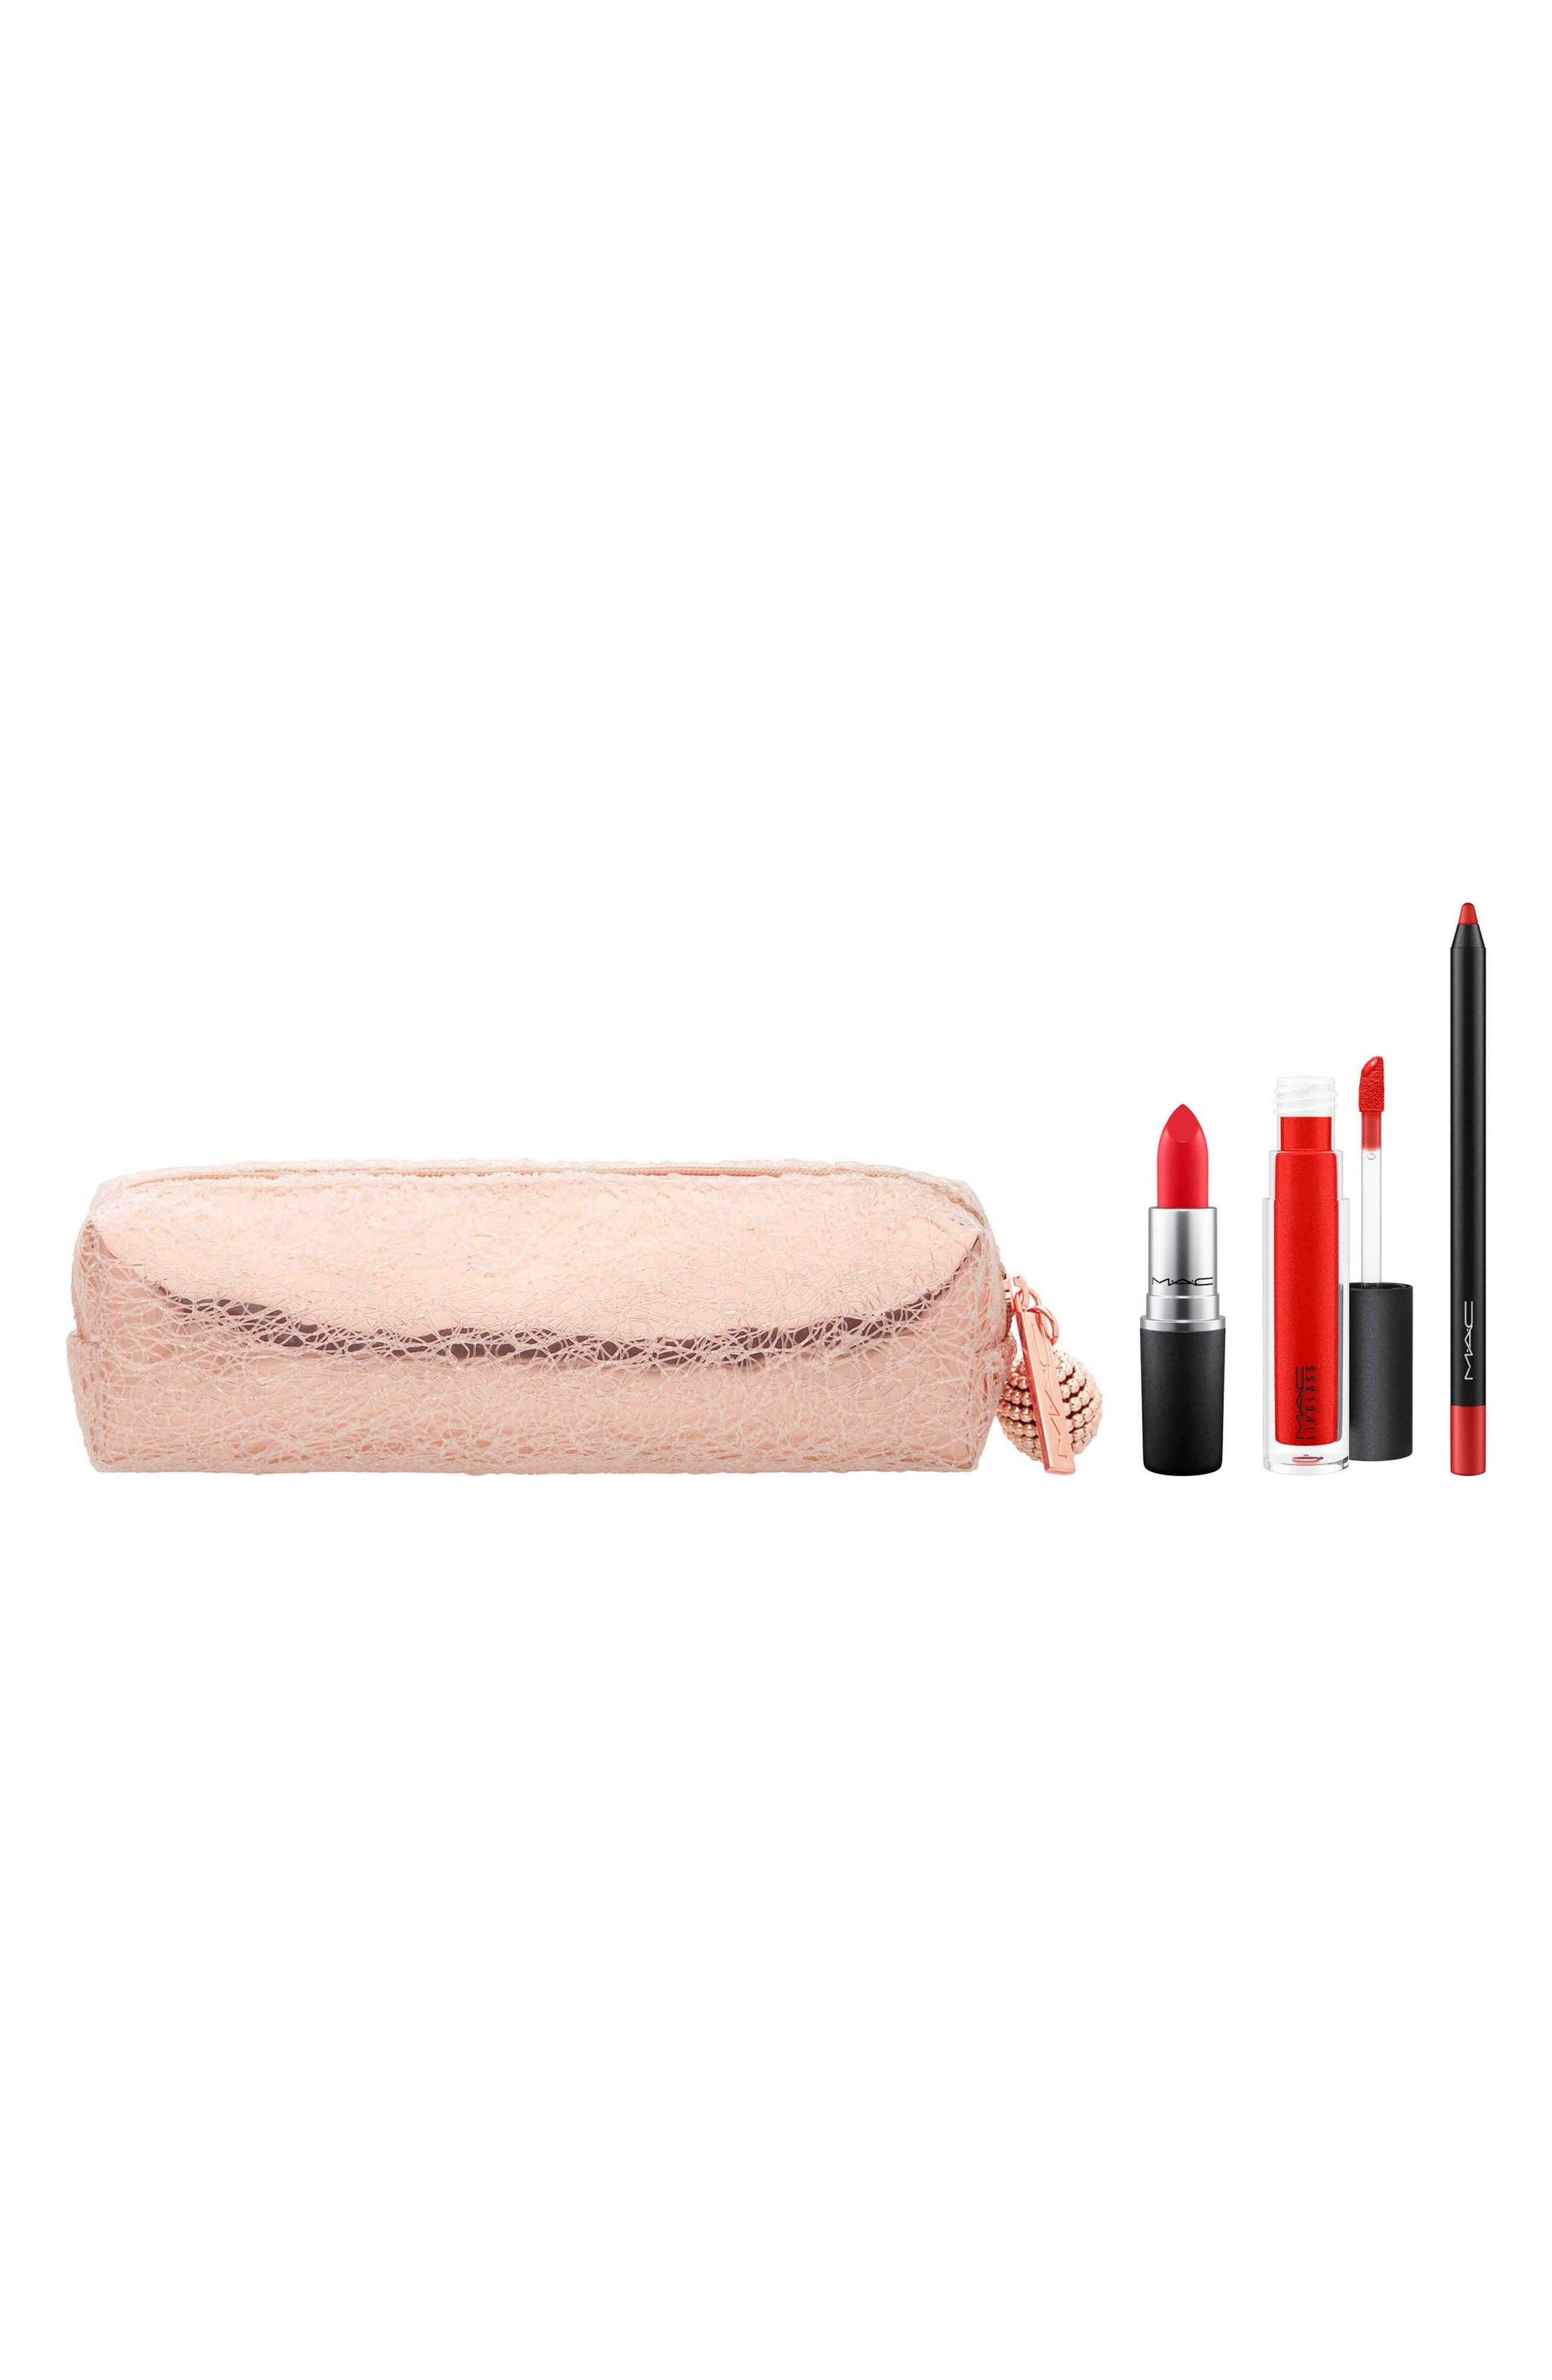 MAC Snow Ball Red Lip Bag ($65.50 Value)